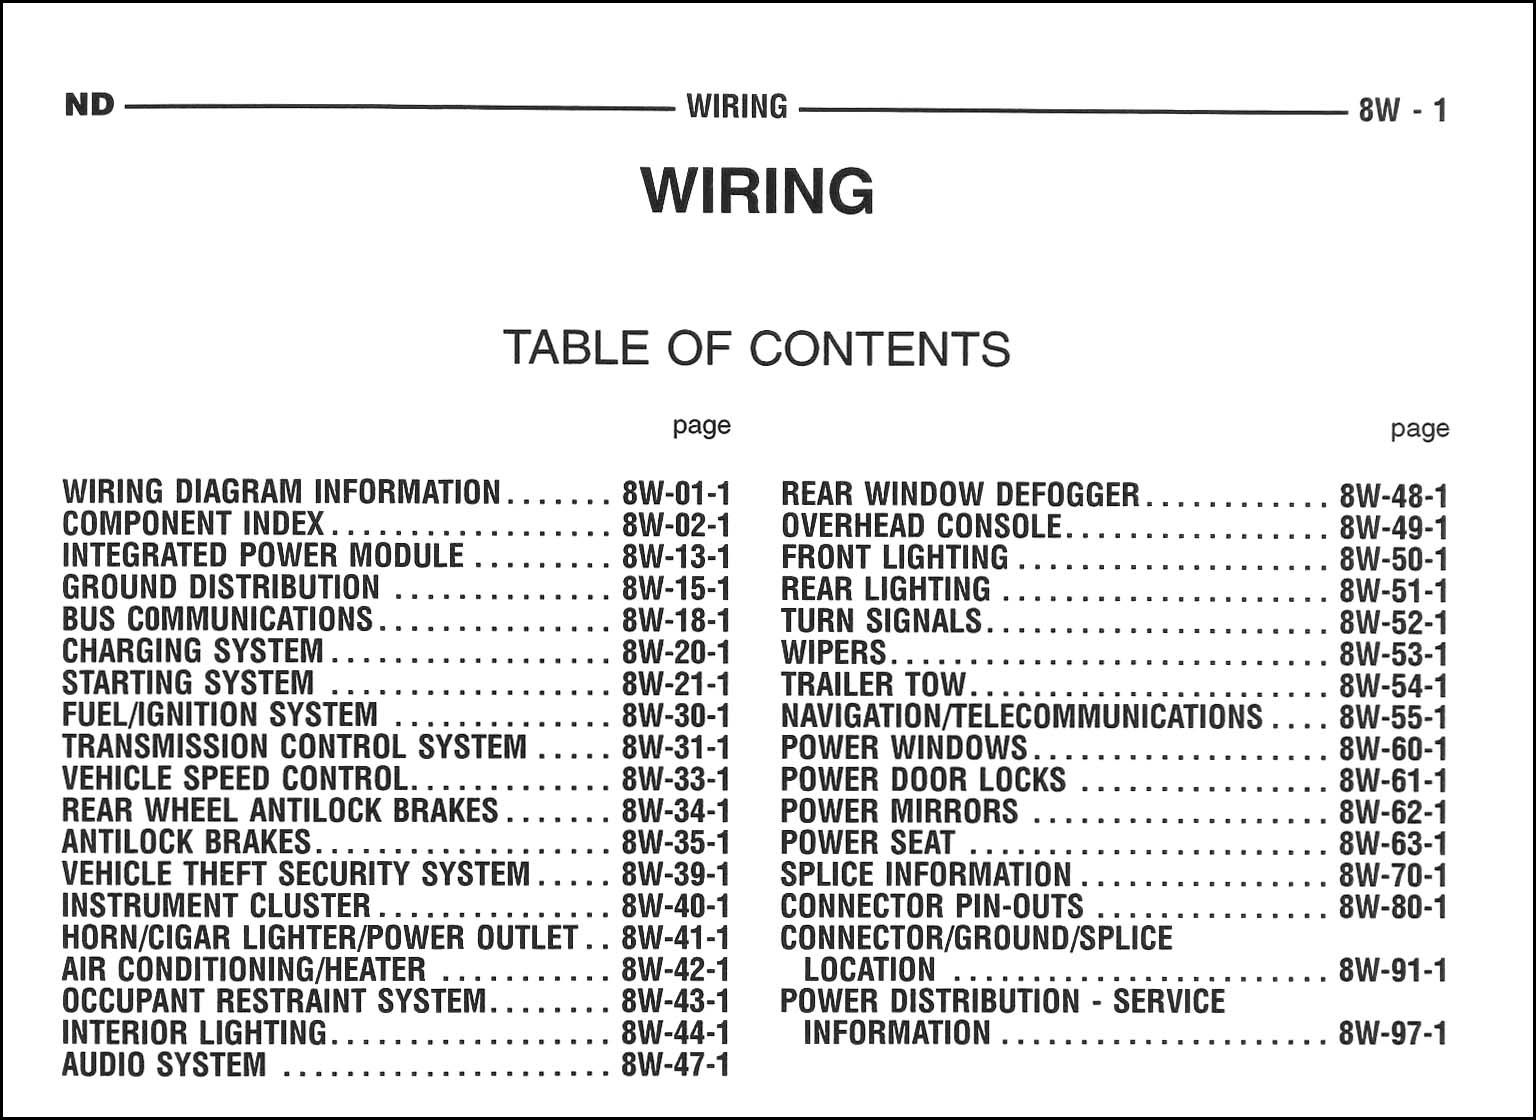 pinouts wiring diagram pcm to ecm 4 7 2002 dodge ram intoautos com image results [ 1536 x 1120 Pixel ]